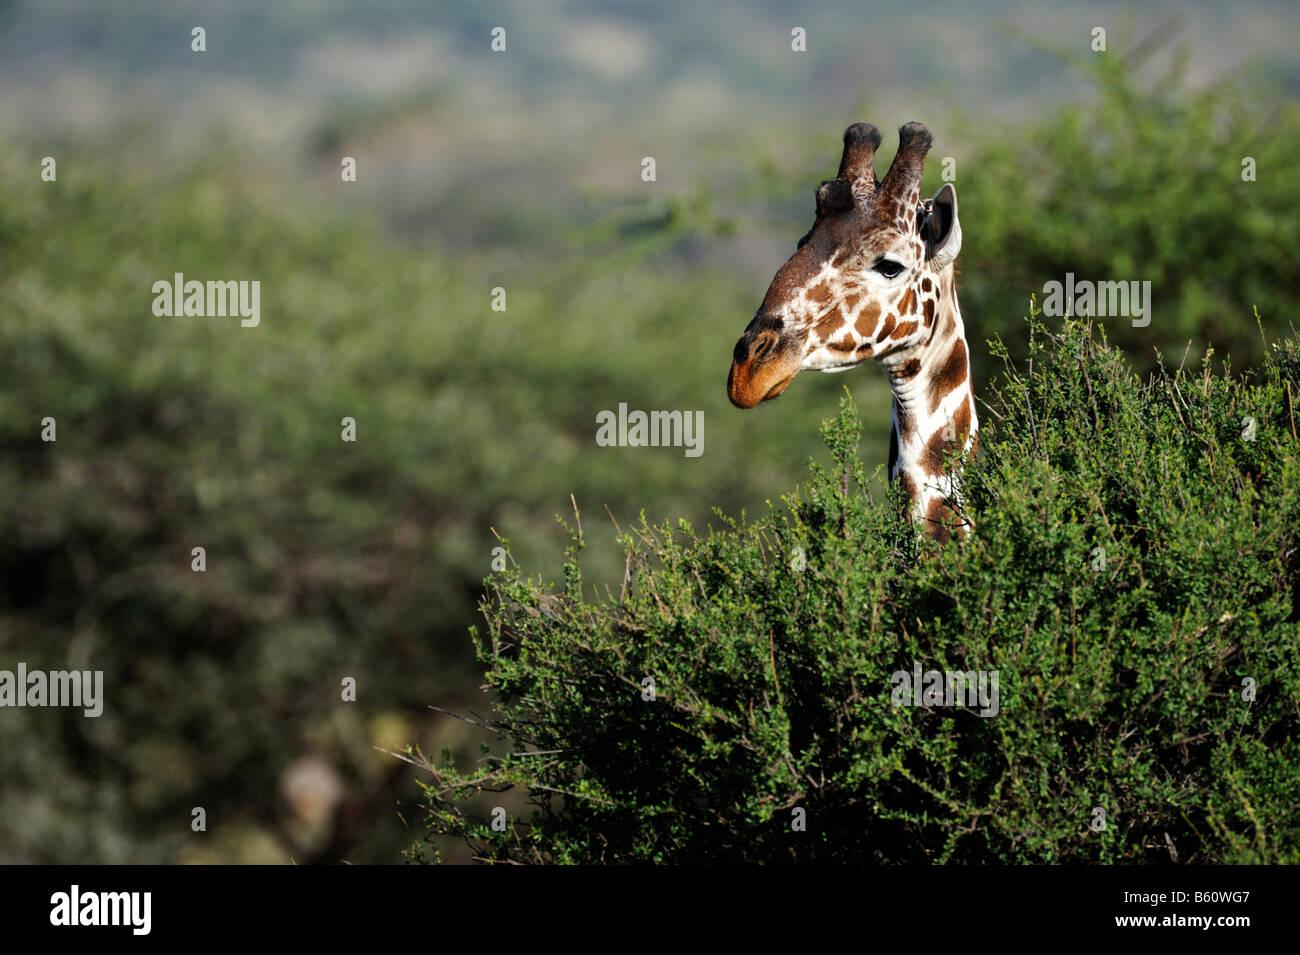 Somali Giraffe or Reticulated Giraffe (Giraffa camelopardalis reticulata), portrait, Samburu National Reserve, Kenya Stock Photo